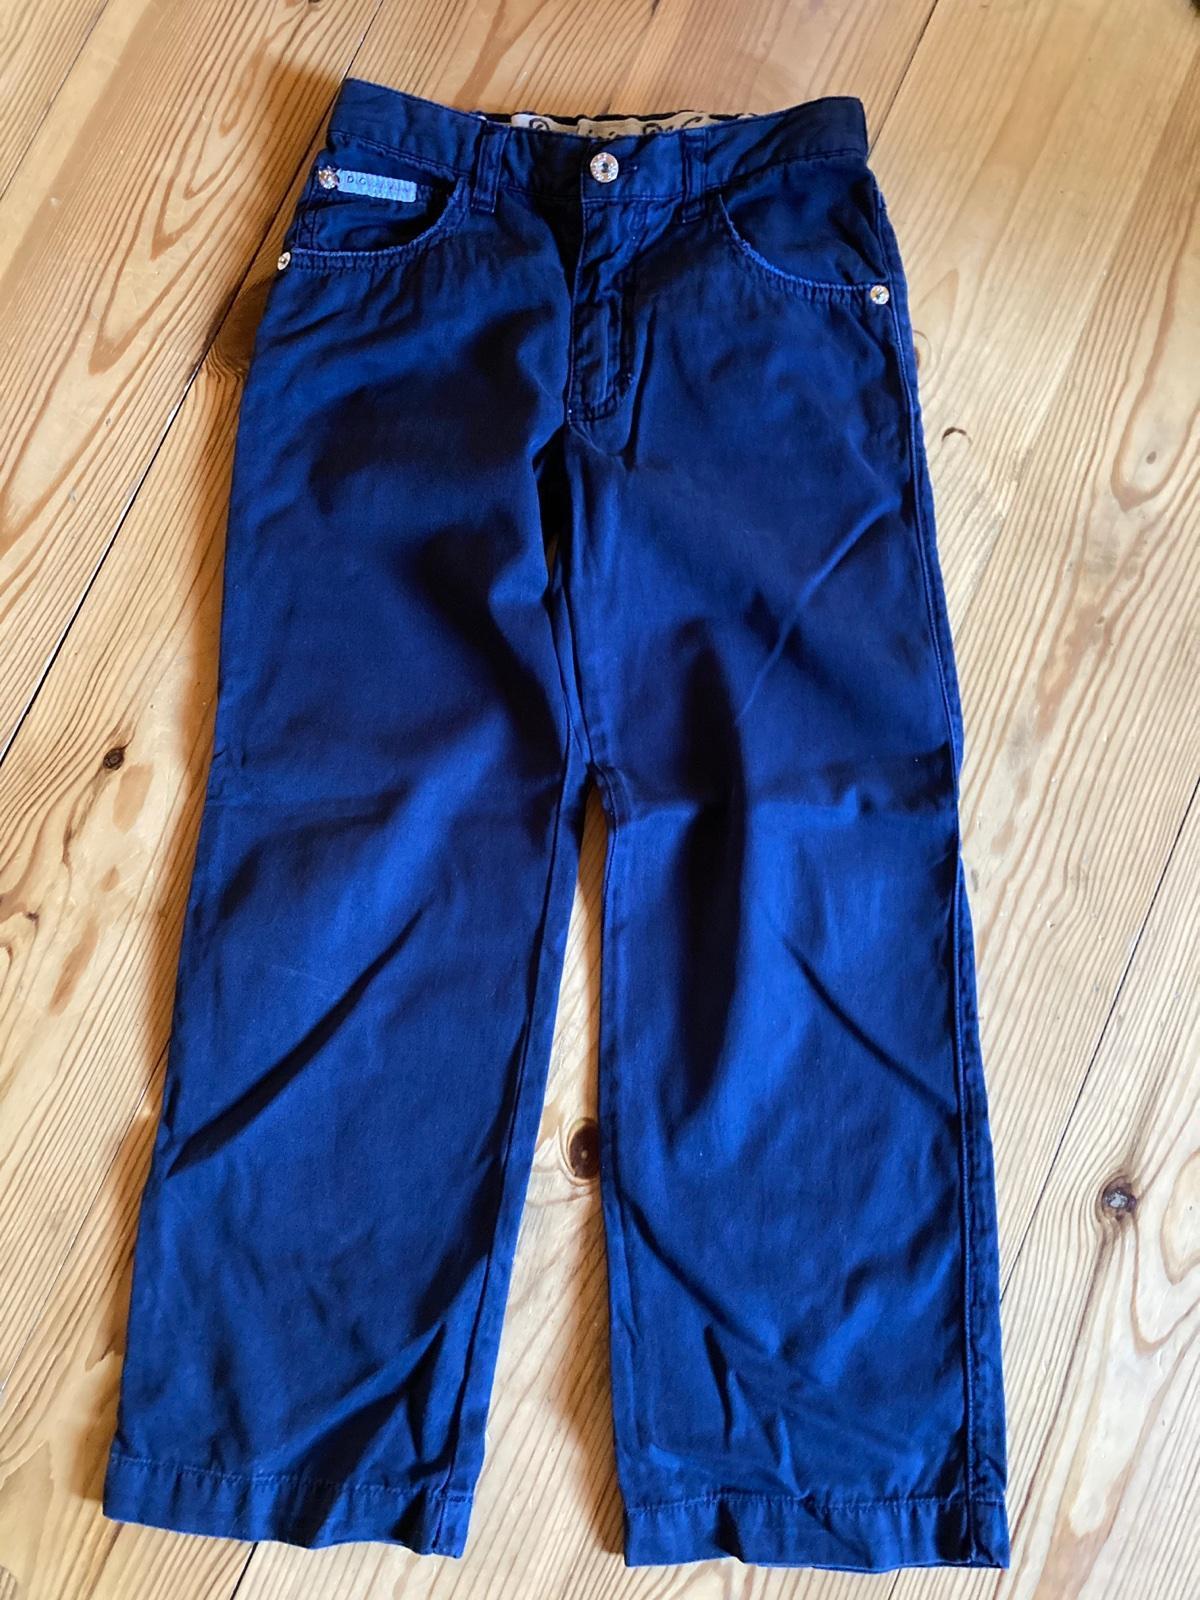 D&G Junior chlapčenské nohavice - Obrázok č. 1